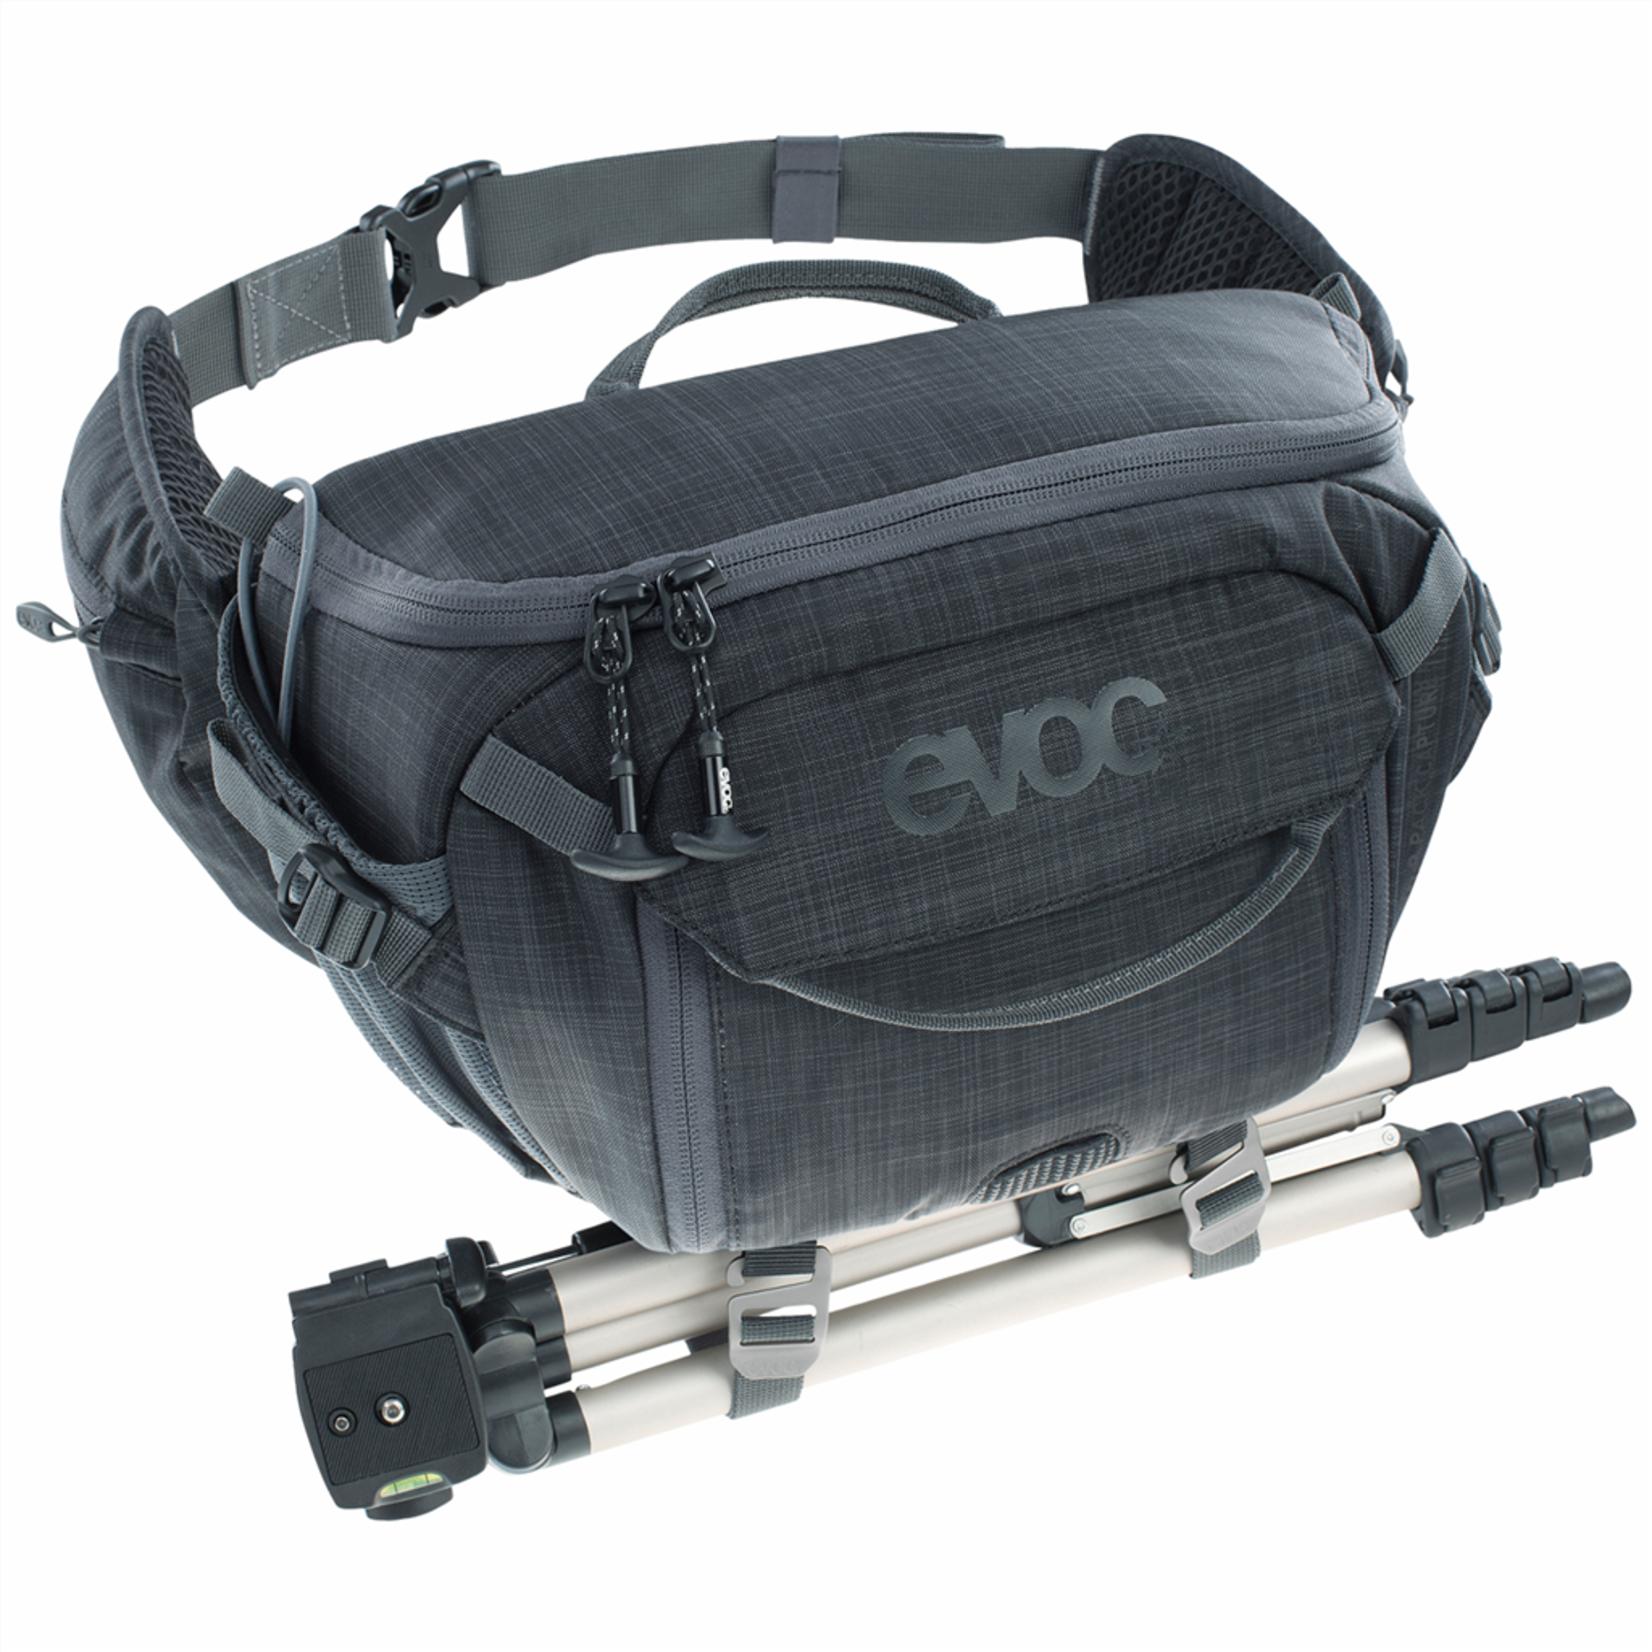 EVOC EVOC, Hip Pack Capture 7L, Bag, 7L, Heather Carbon Grey